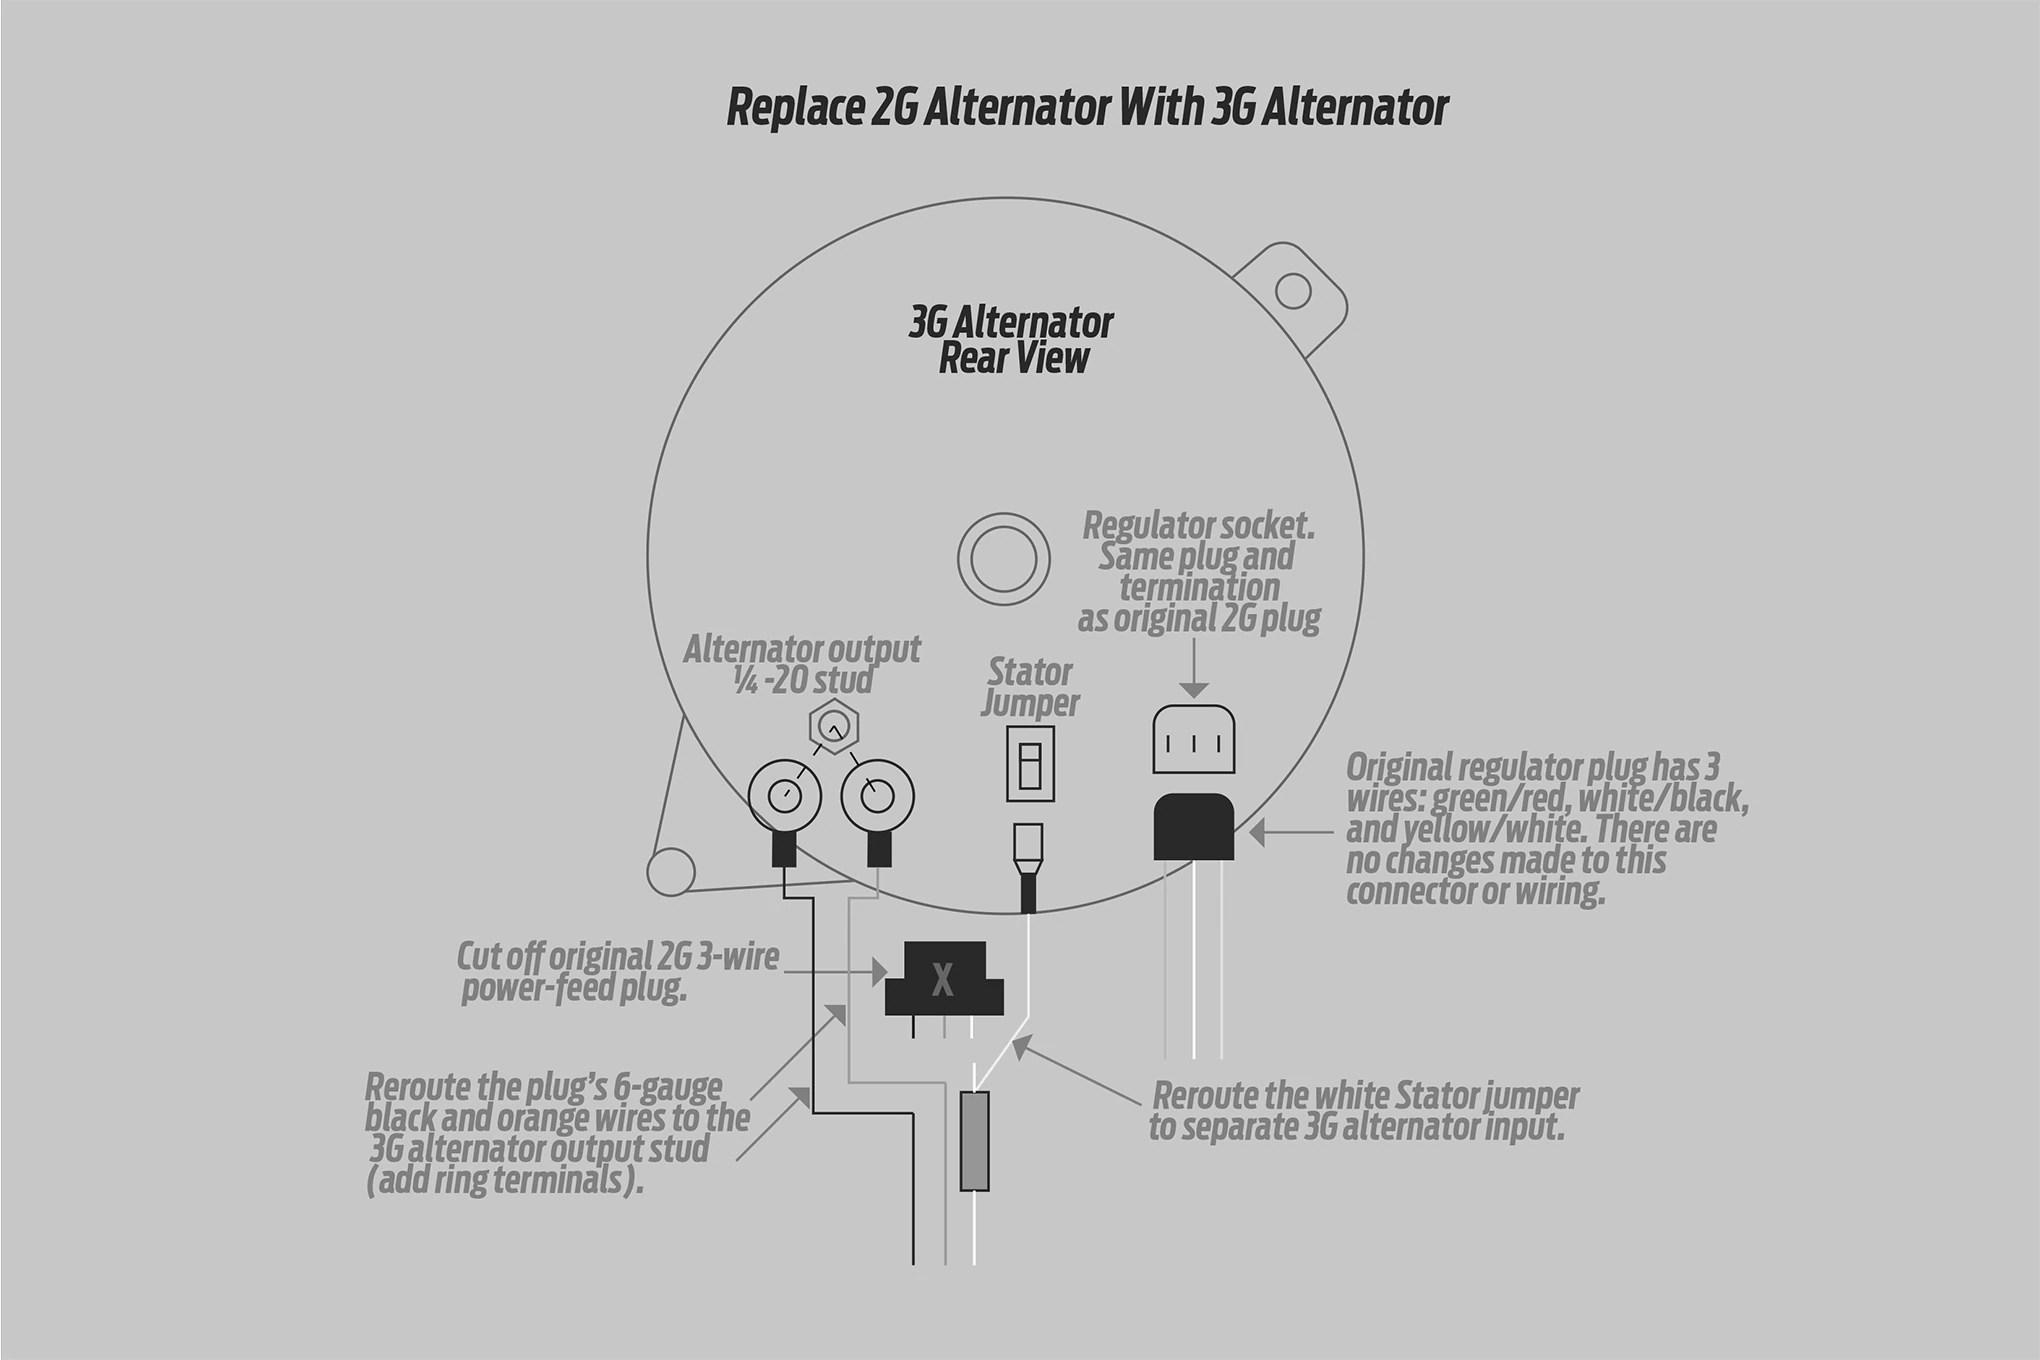 hight resolution of ford 2g alternator wiring wiring diagram mega ford 2g alternator wiring